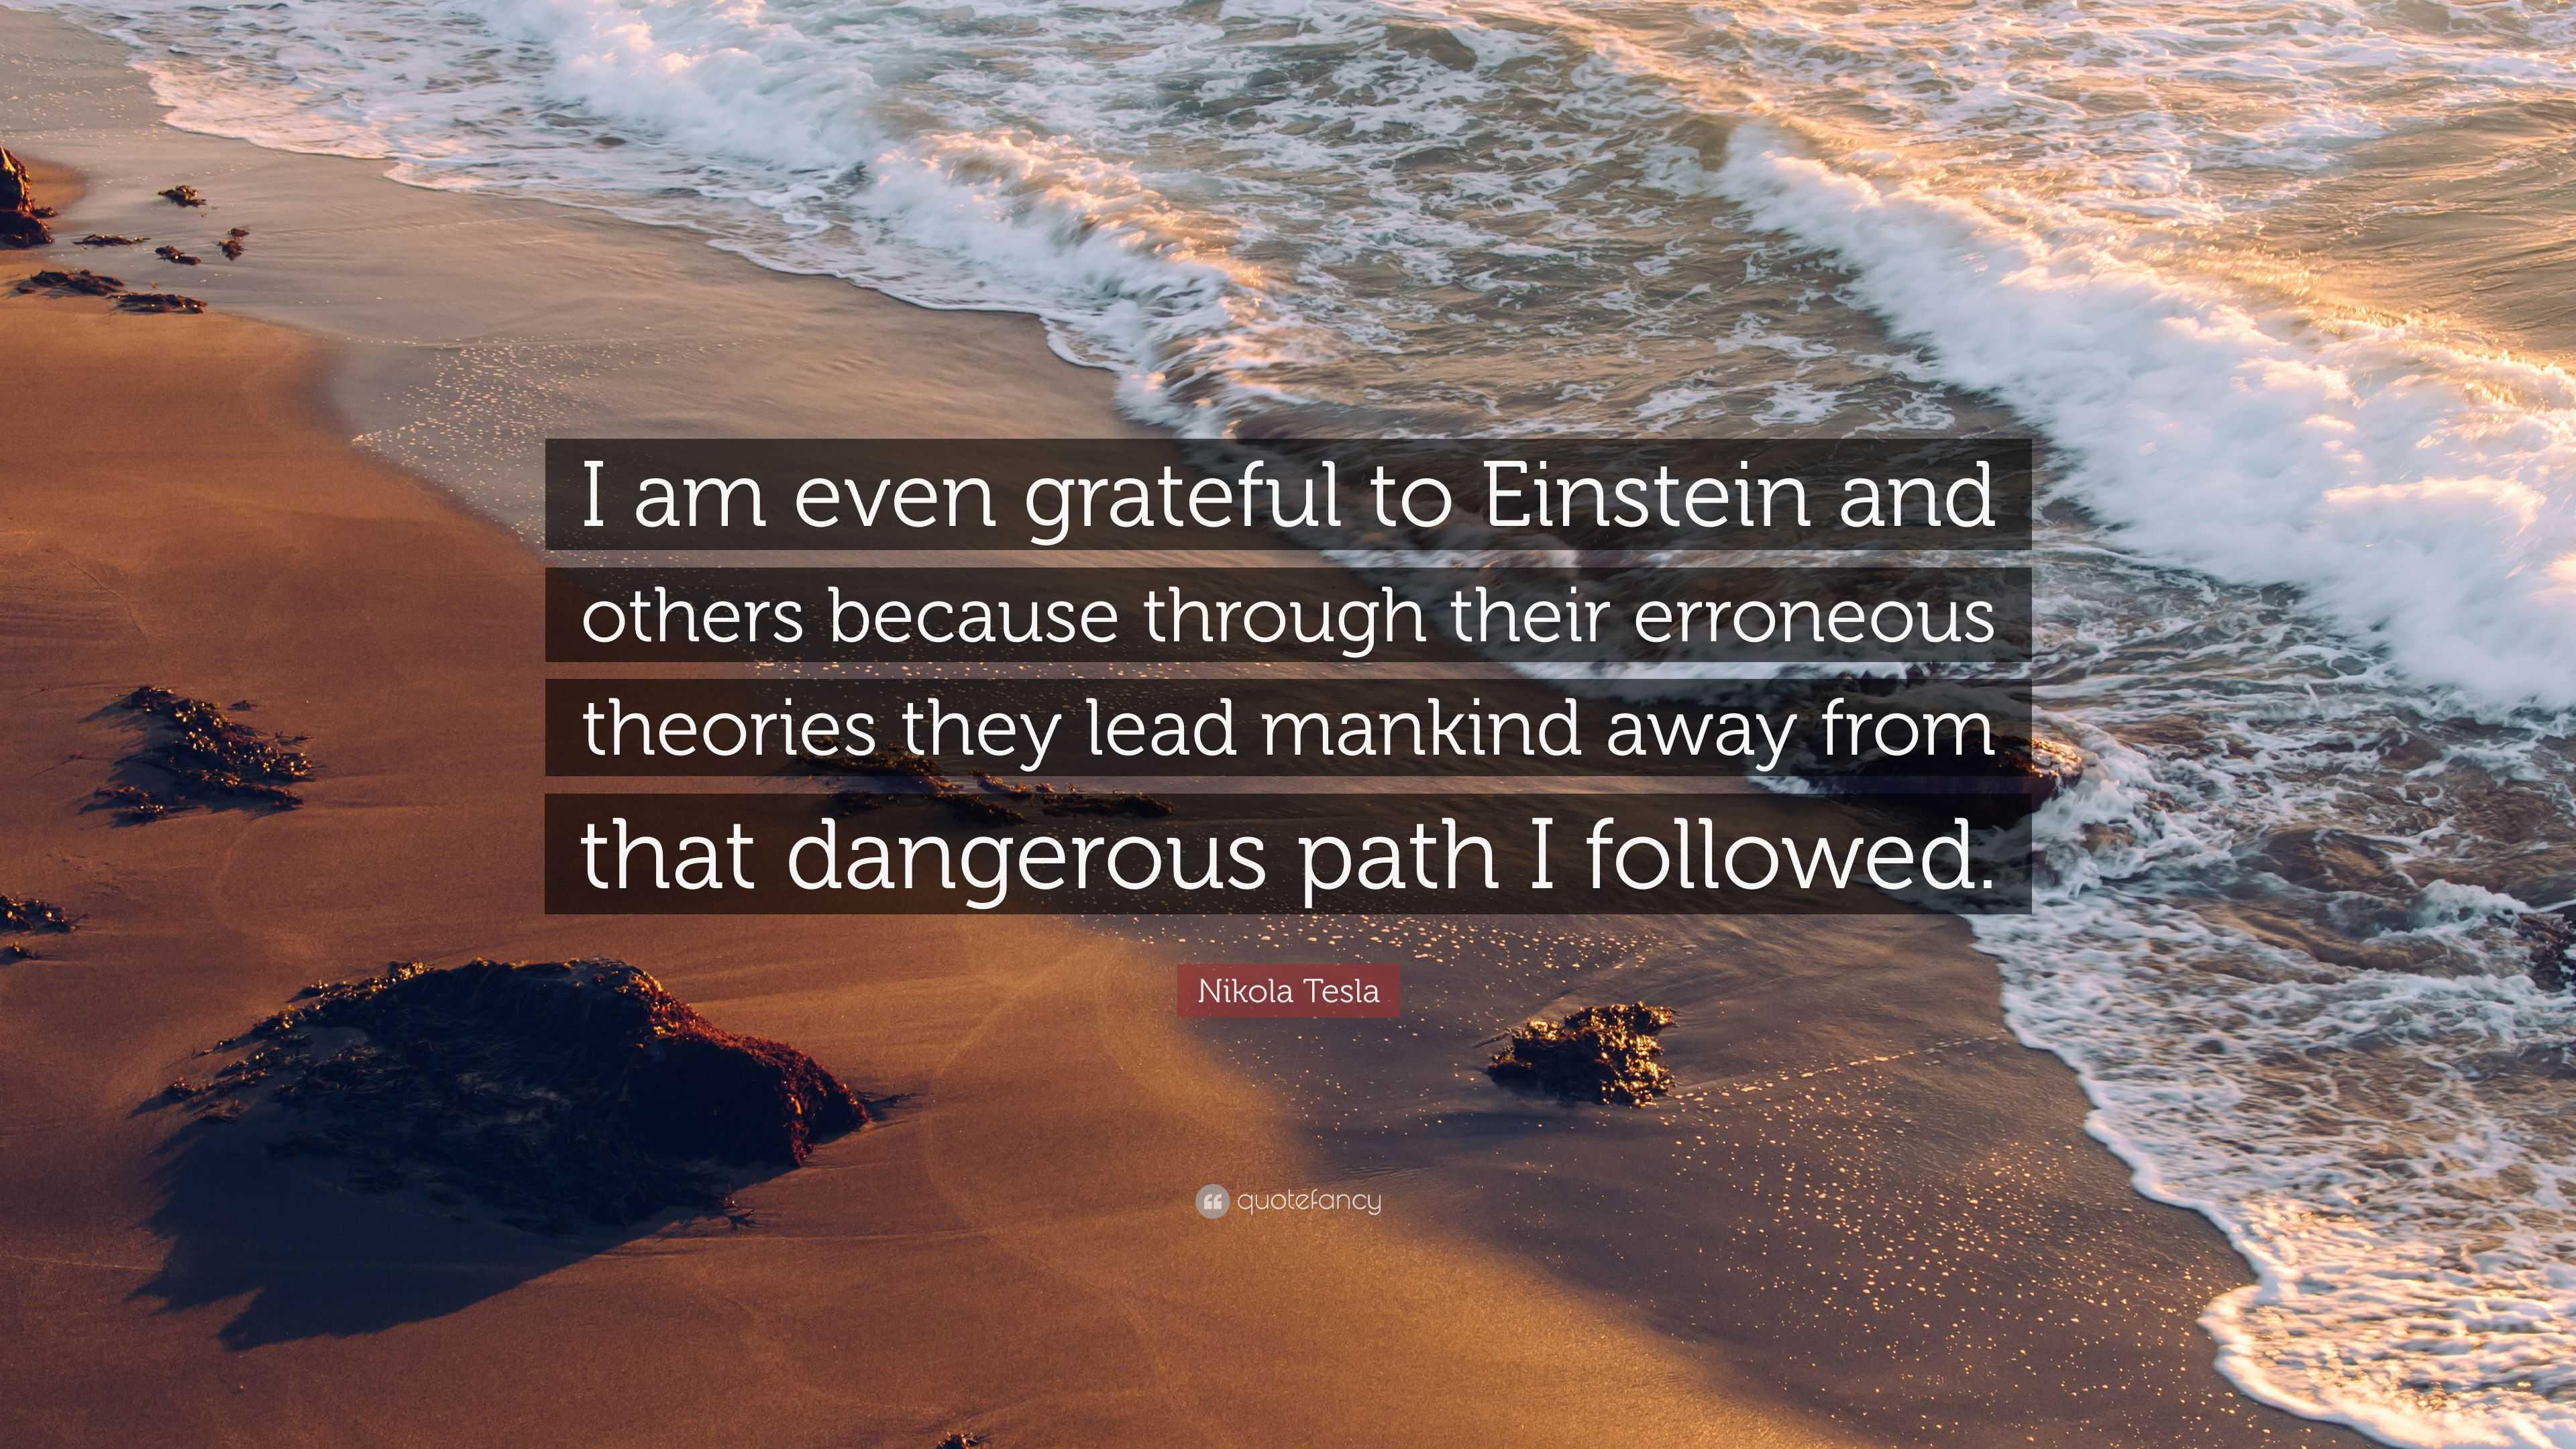 Nikola Tesla Quote I Am Even Grateful To Einstein And Others